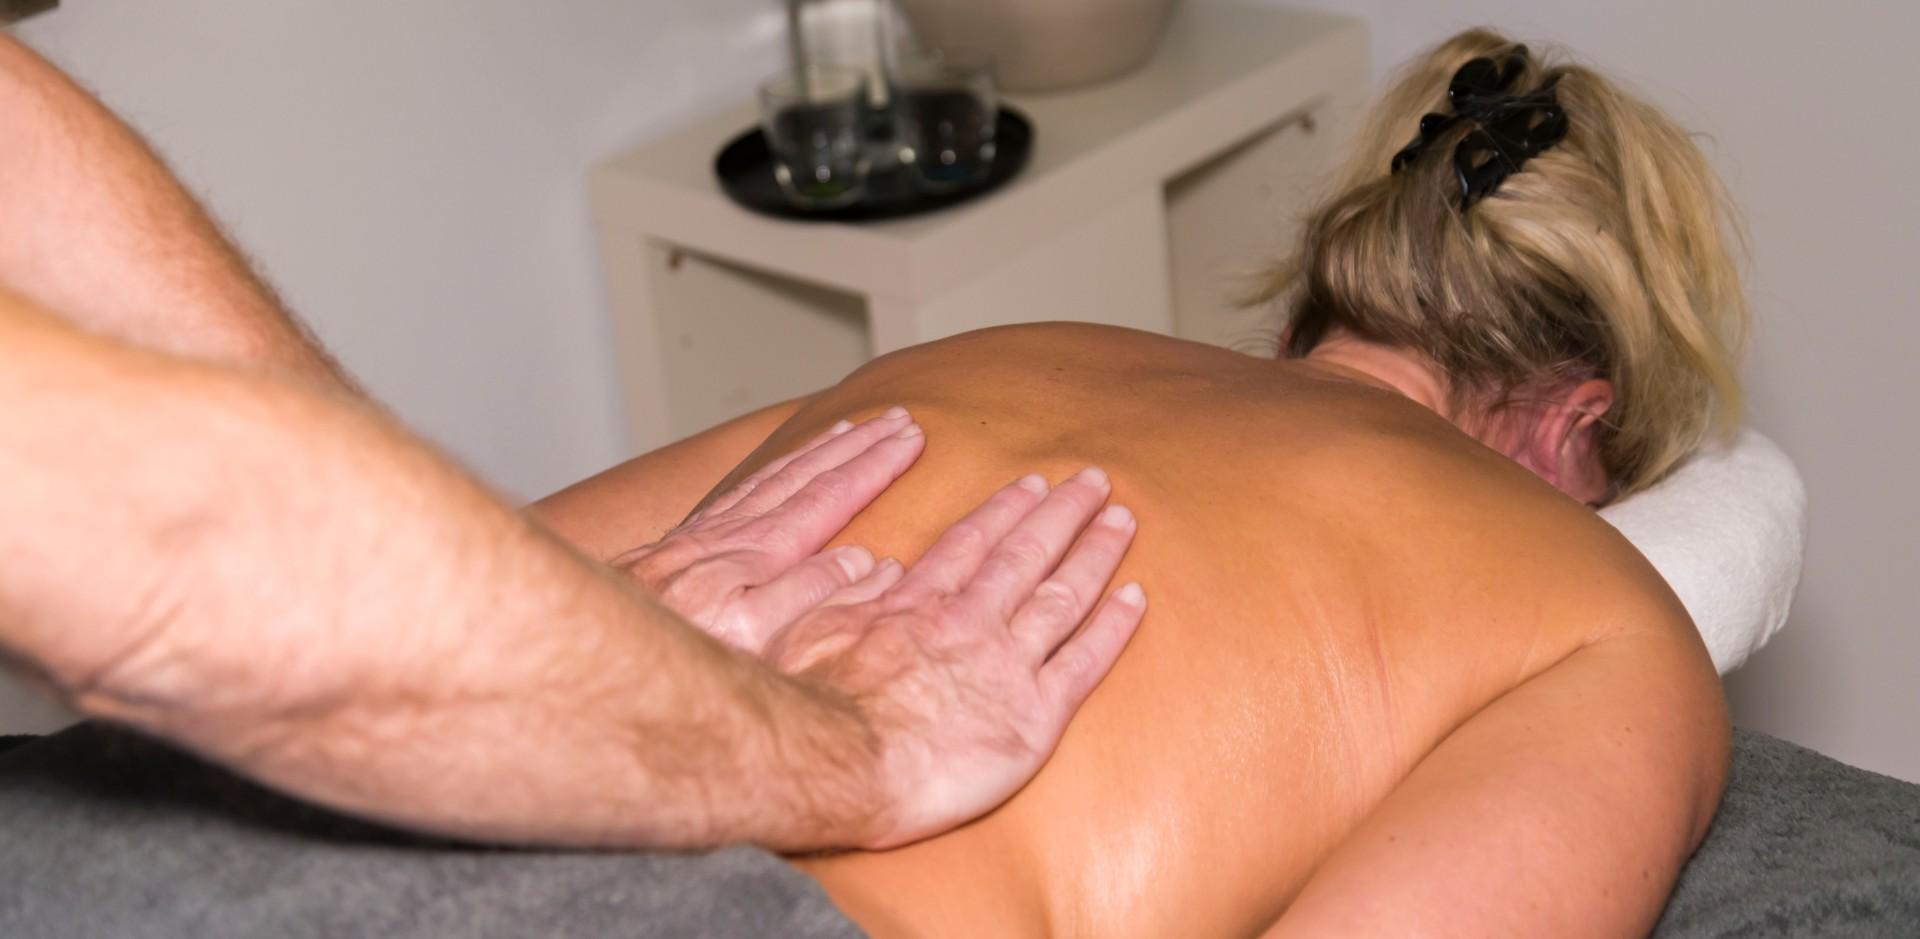 ontspanningsmassage in Amersfoort bij Massage Helpt